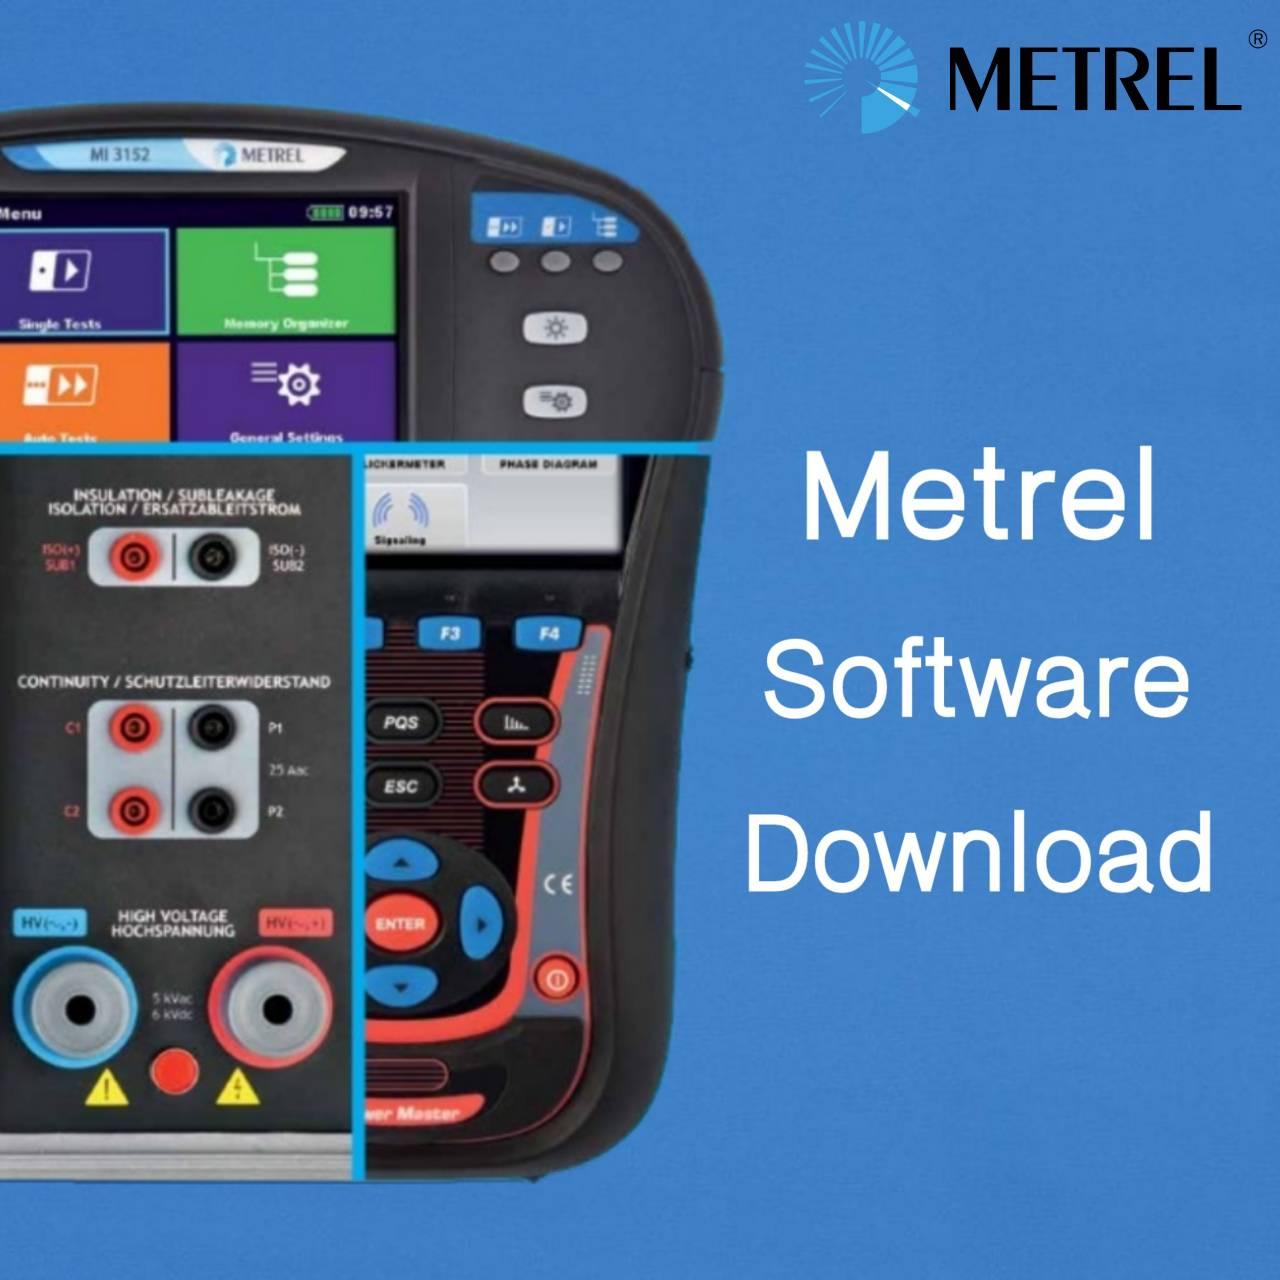 Metrel Software Download